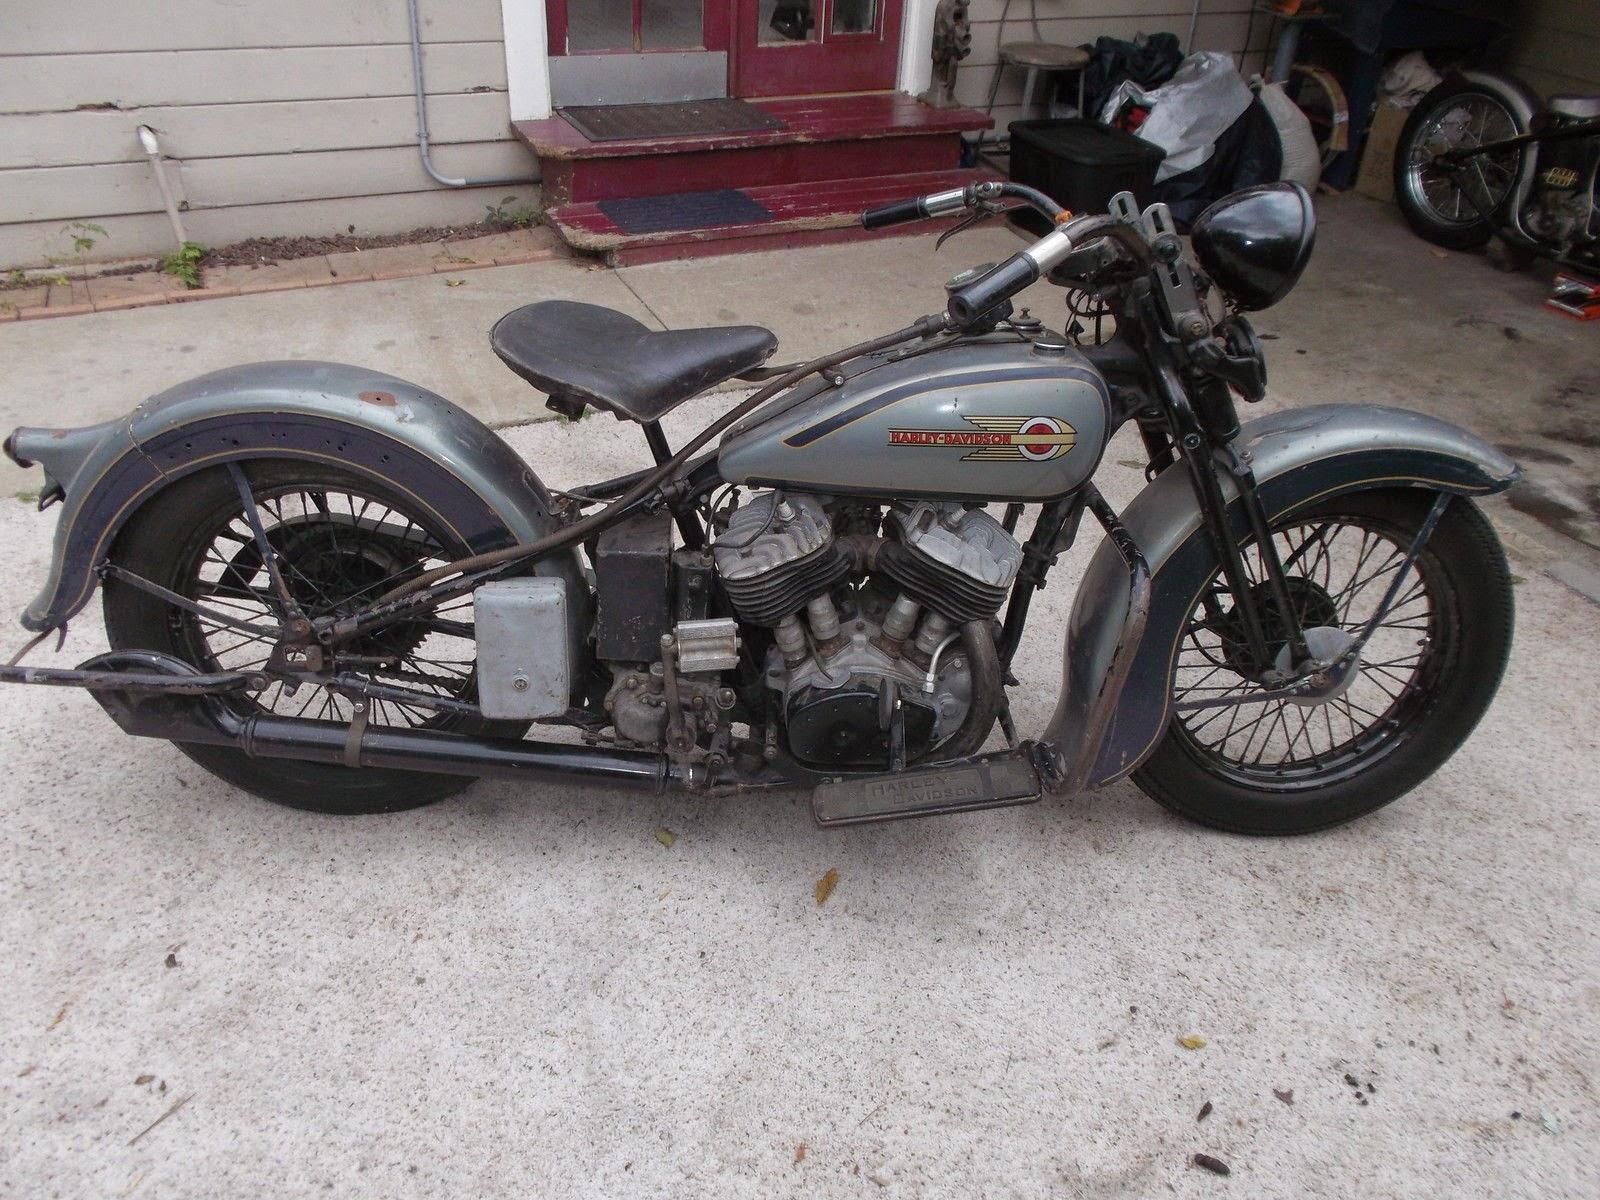 1936 Harley Davidson Barn Find - Rusty Knuckles - Motors ...